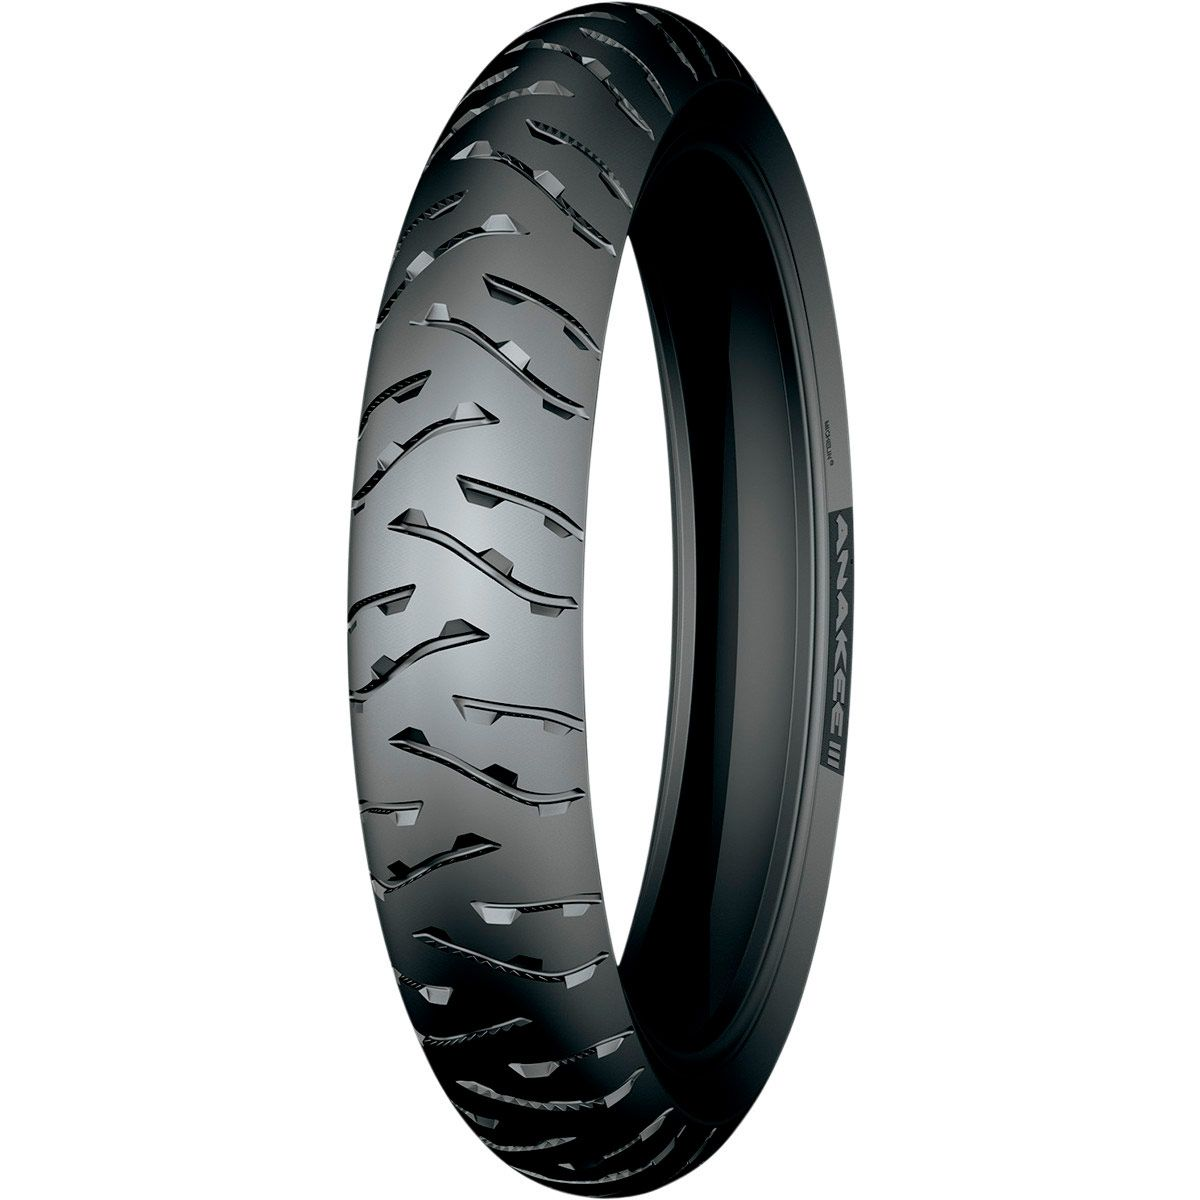 Pneu Diant Michelin 90-90-21 Anakee 3 54v 118941